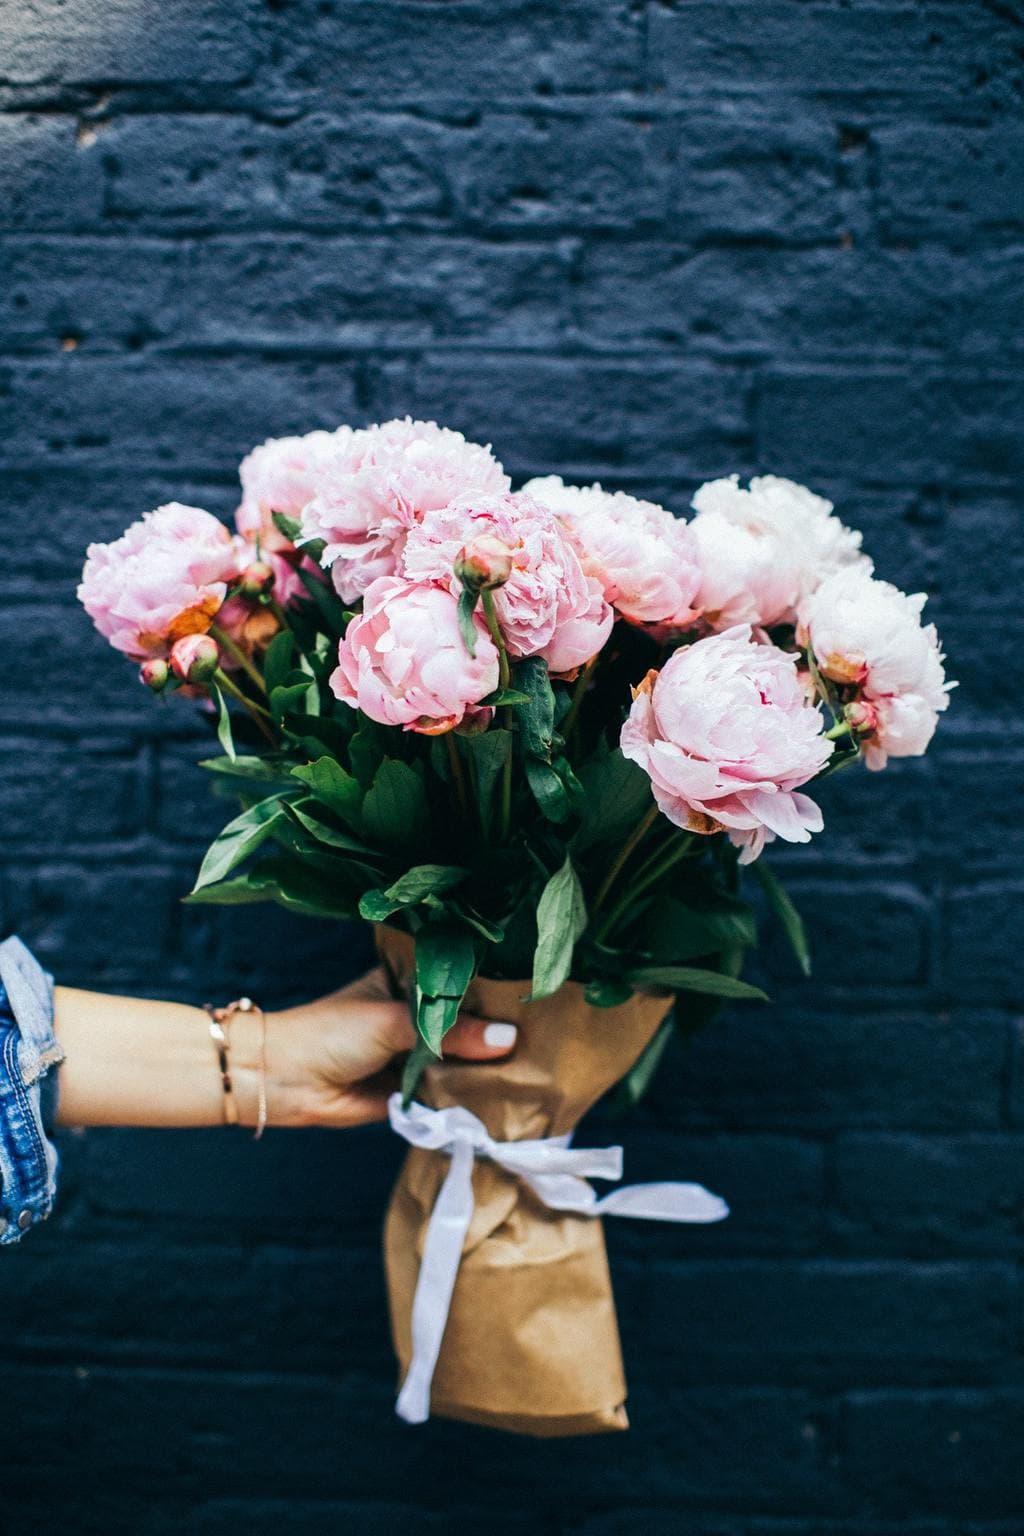 pink-flower-bouquet-stock-photo